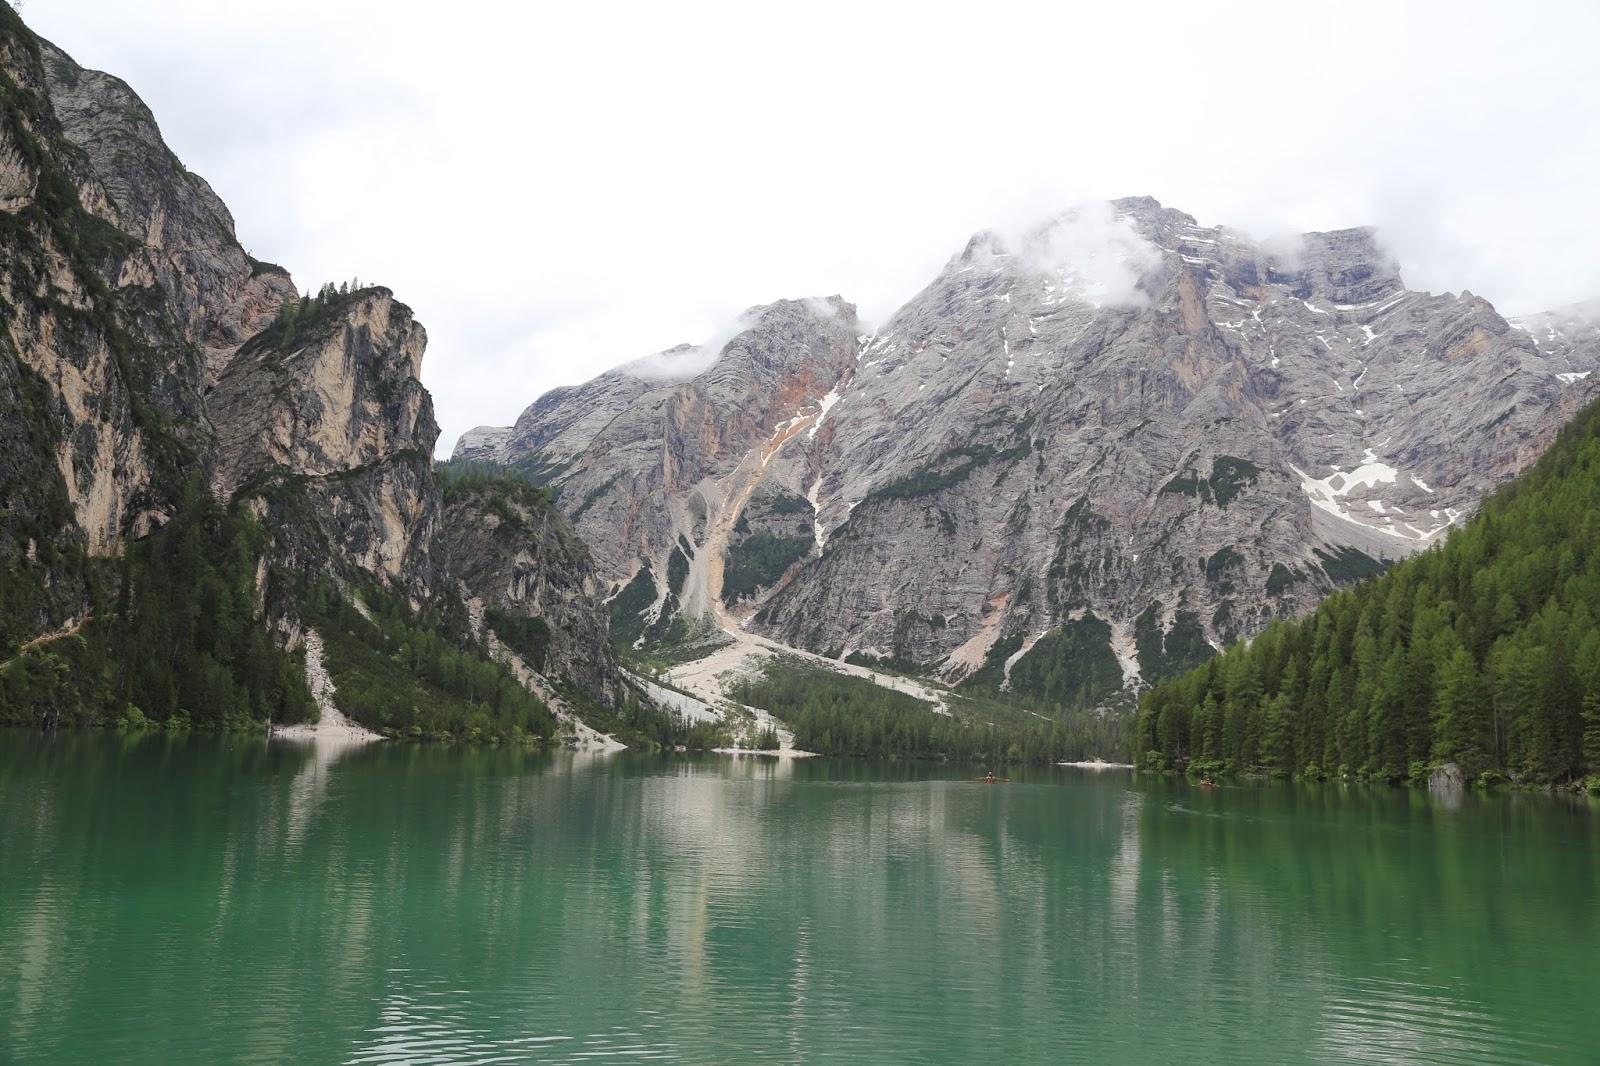 Fashionstylebyjohanna - Südtirol - Fedora Hut - Blogger - Austria - Outdoorblogger - Haglo- LagoDiBraies -SüdTirol - Pragser Wildsee-Best-Mountain-Artists-Outdoorblig - Austriablogger -Outdoorbloggerin